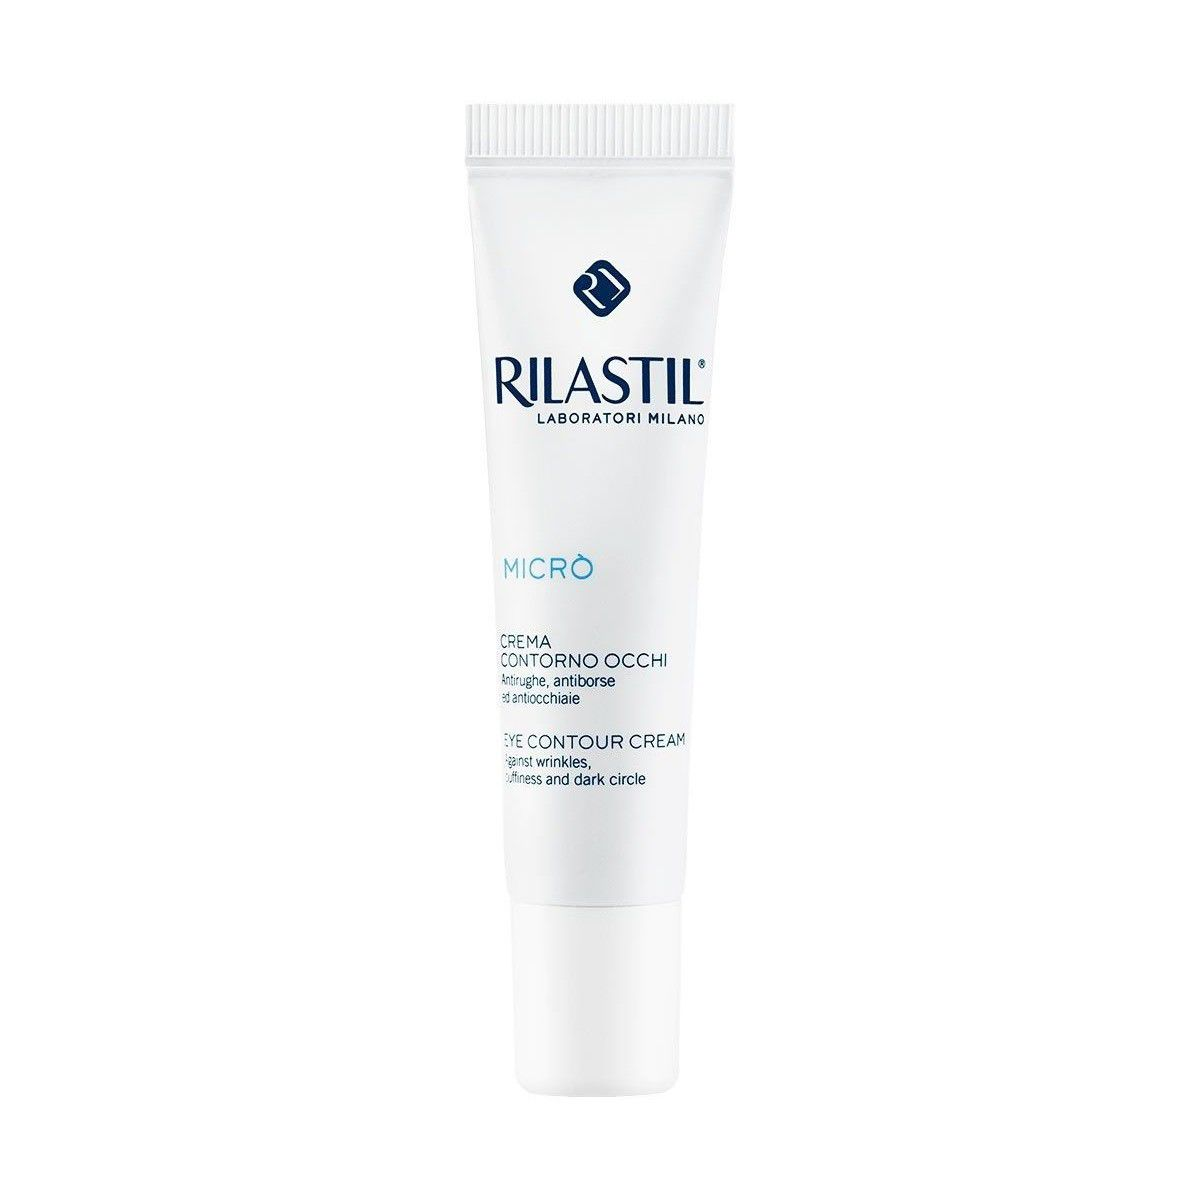 Rilastil Micro Eye Contour Cream